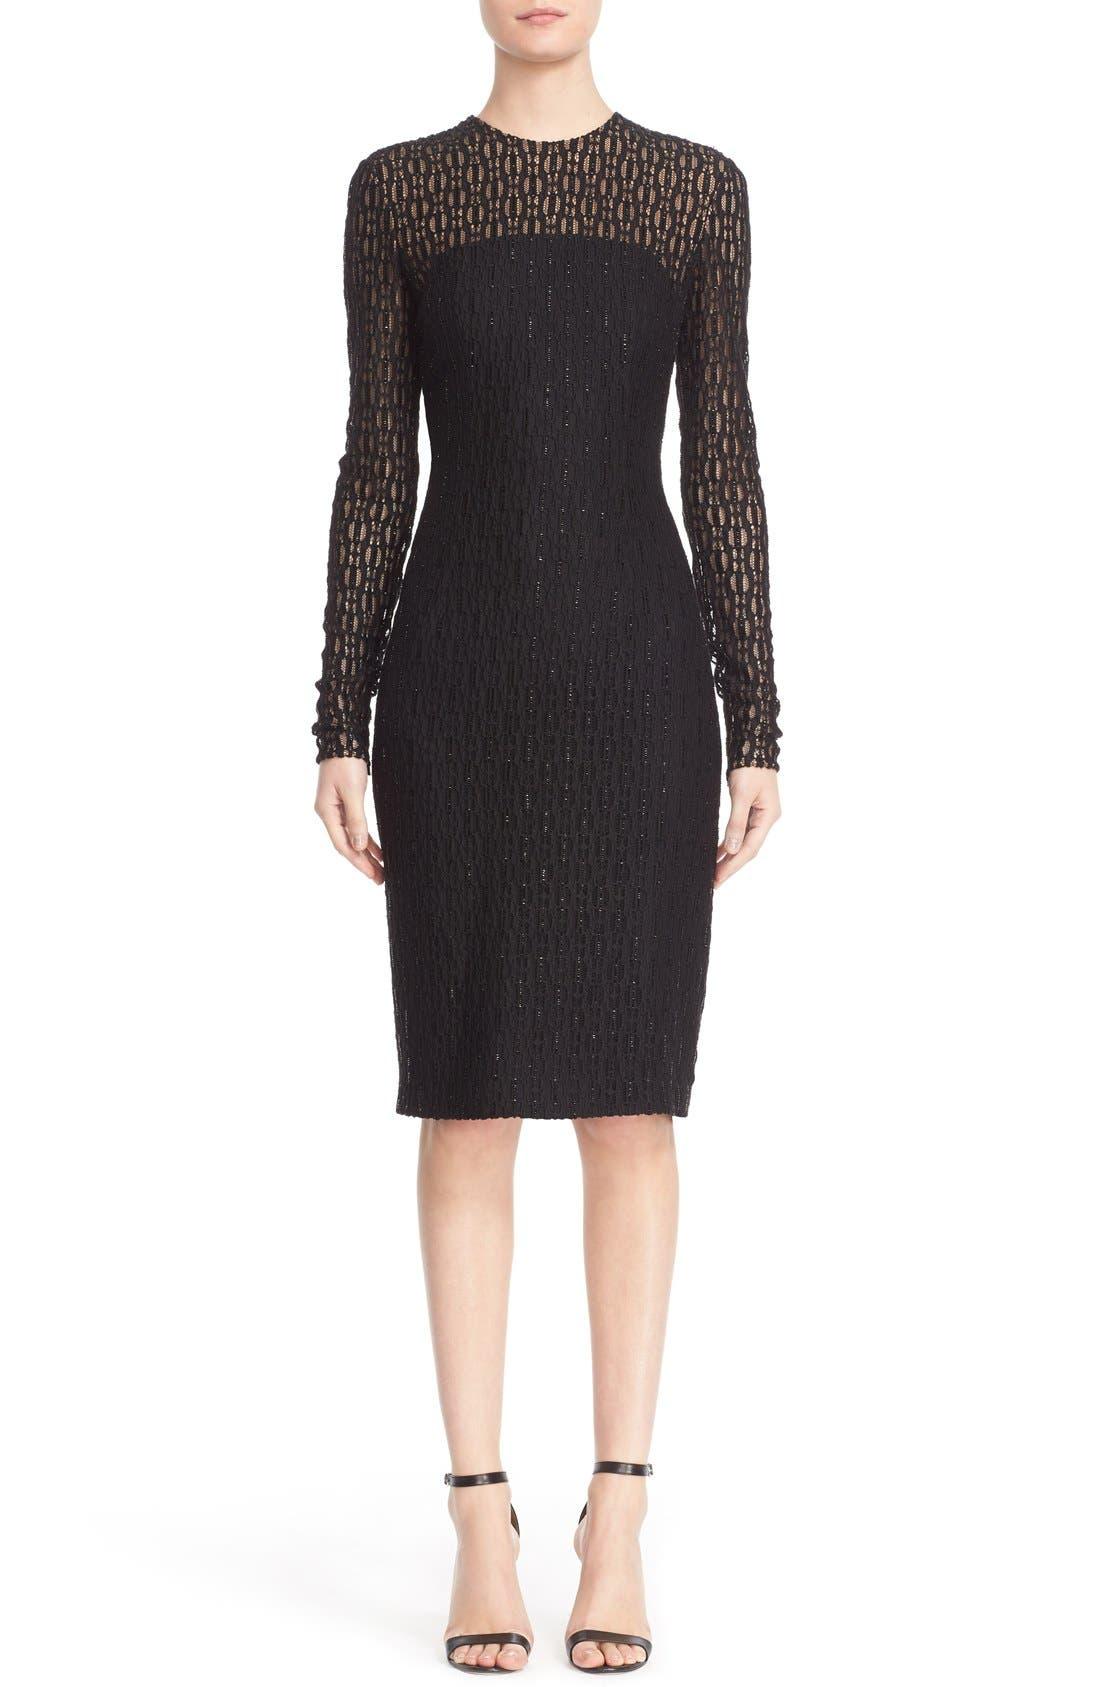 Embellished Illusion Lace Knit Sheath Dress,                             Main thumbnail 1, color,                             001